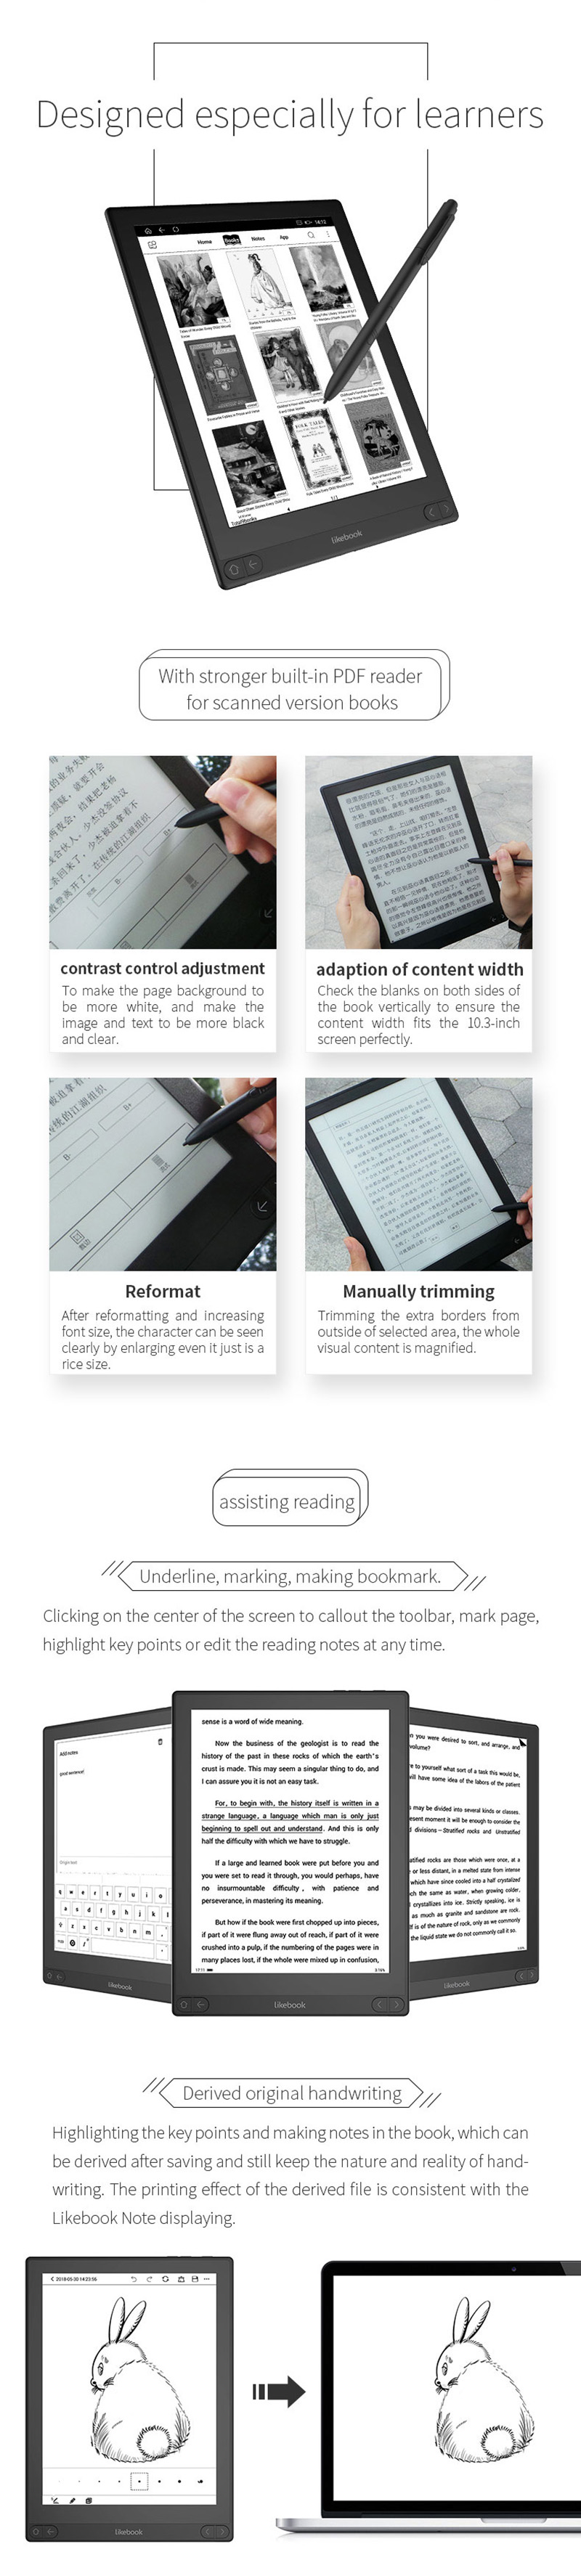 boyue likebook note 10 3 inch Ebook reader with wifi/BT